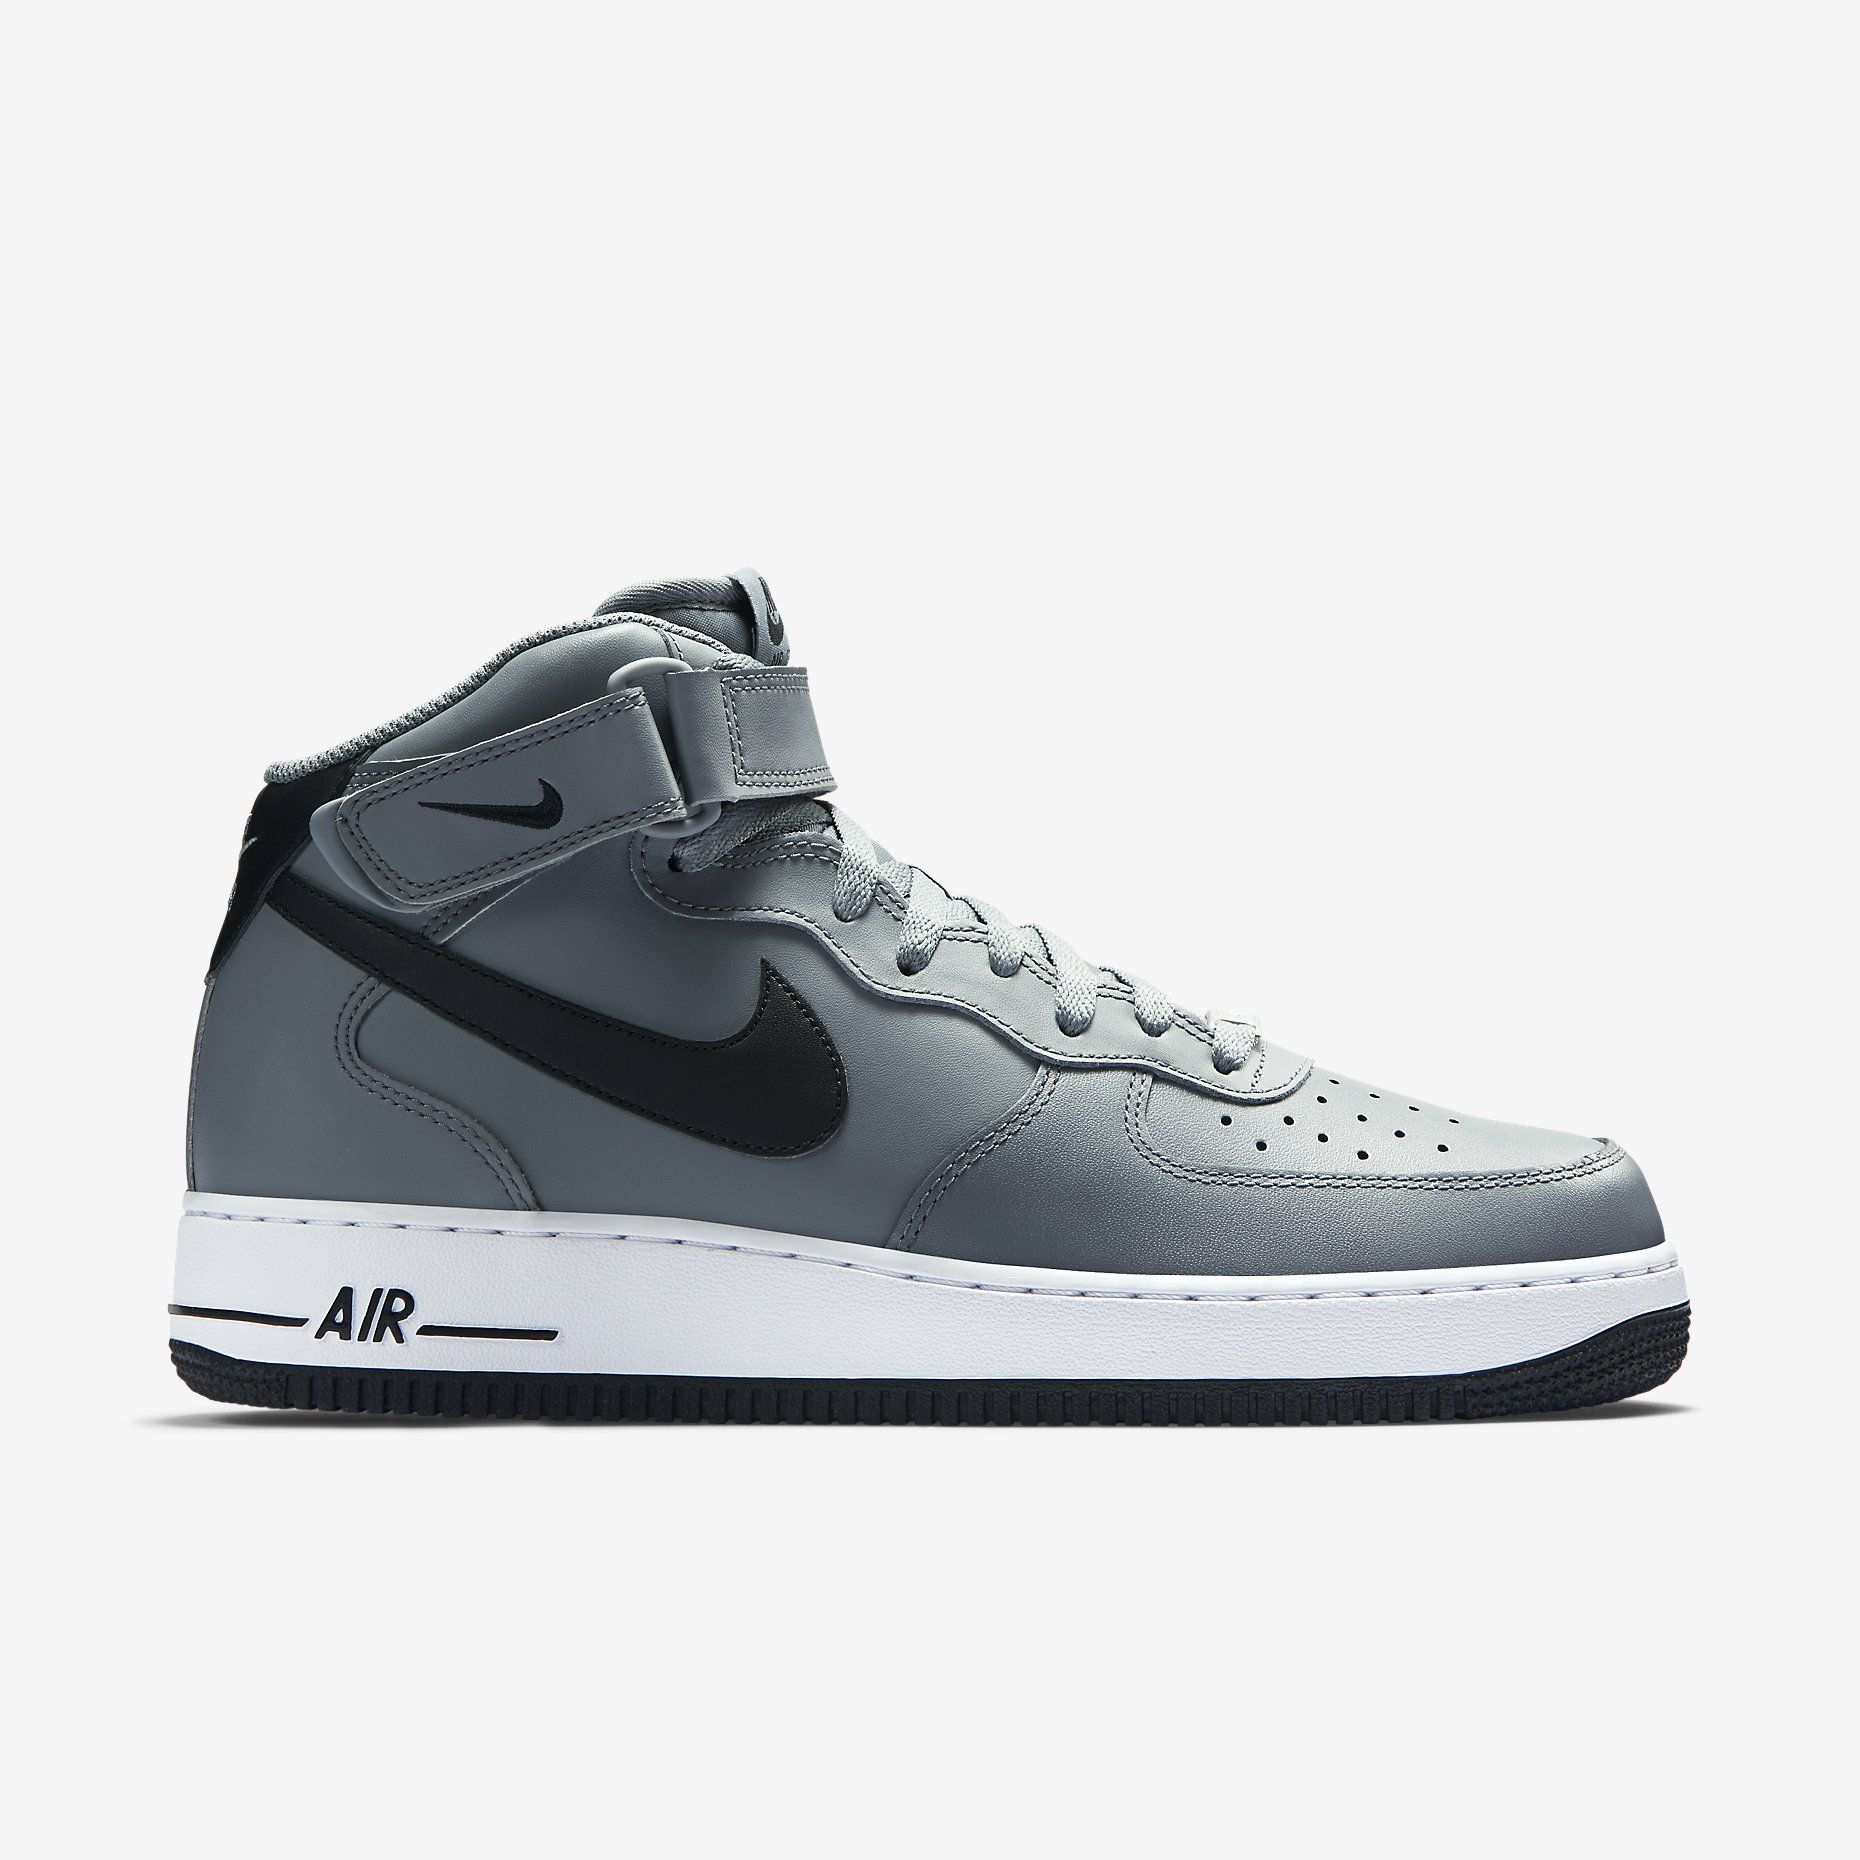 Nike Air Force 1 Mid 07 Men S Shoe Cool Grey White Black Nike Shoes Mens Nike Air Force